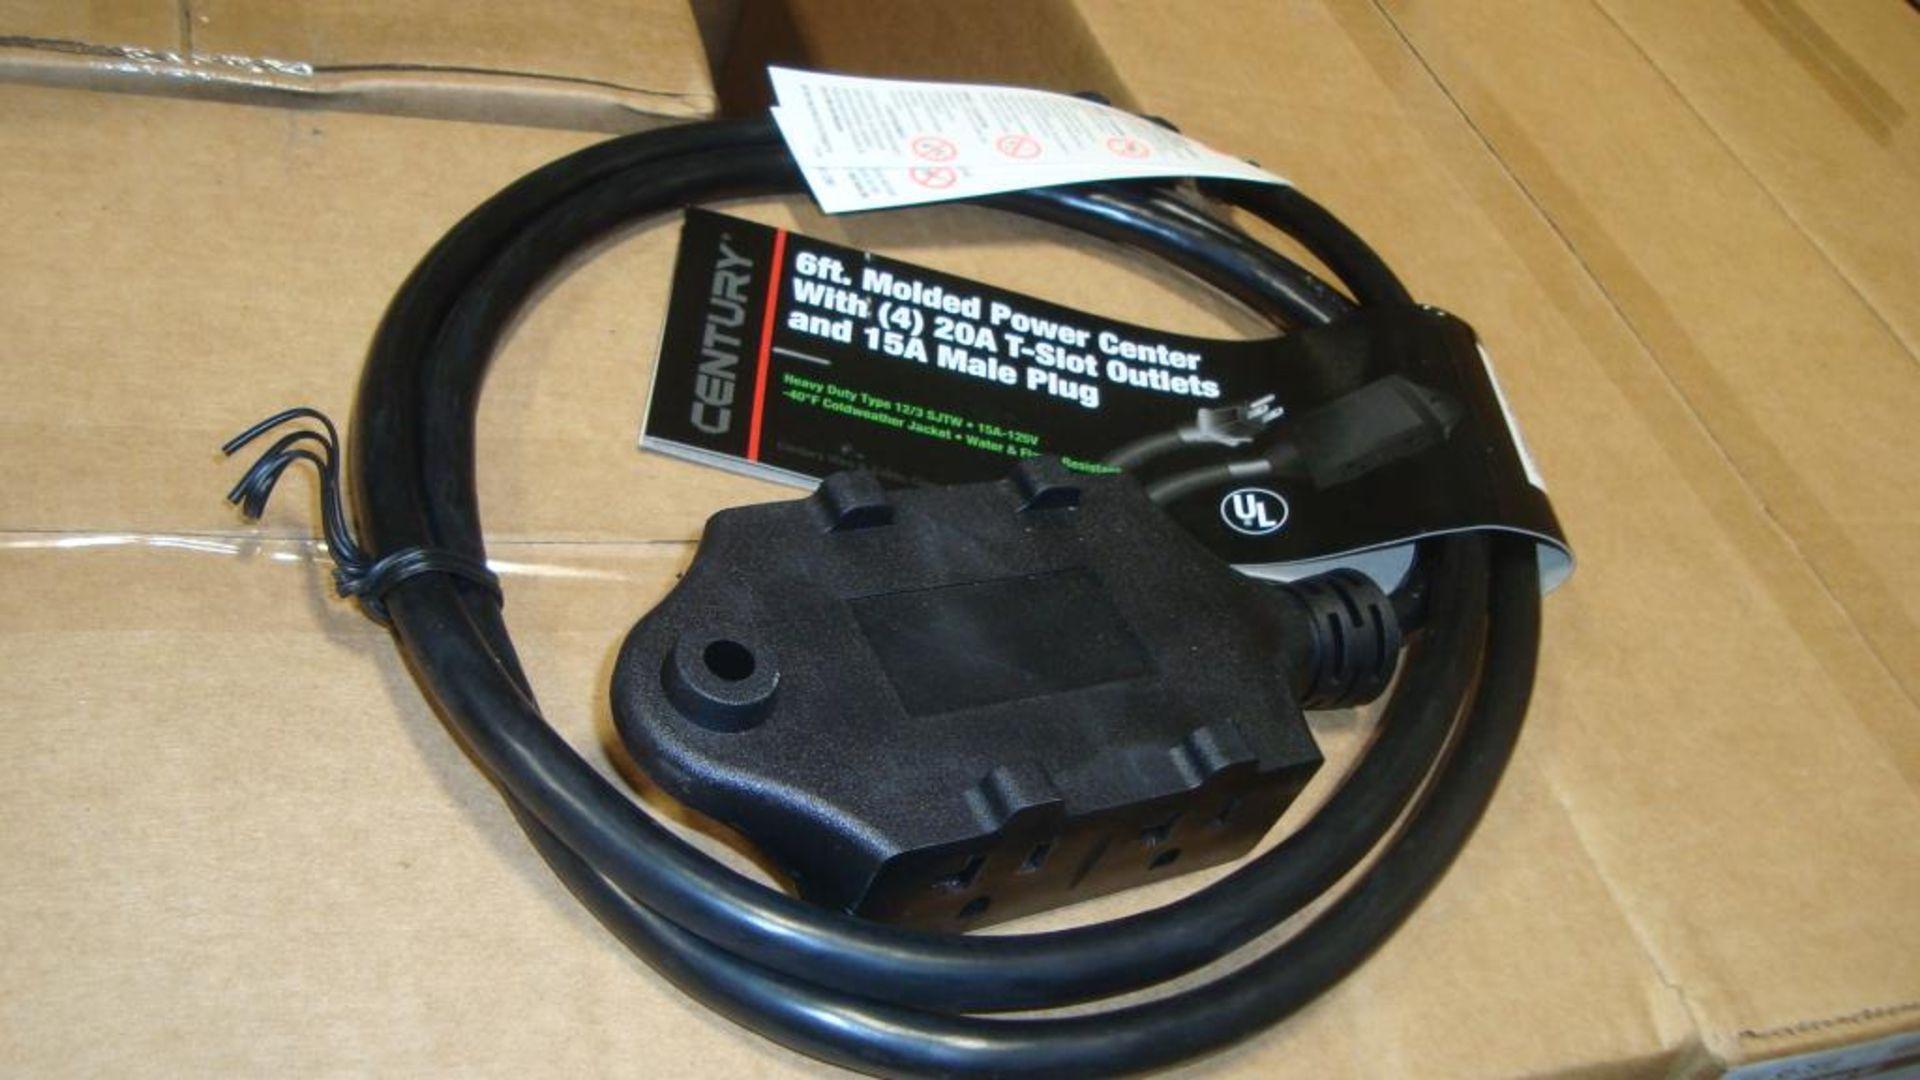 Extension Cords. Lot: 648 Total (27 Boxes - 24 ea.) Century Wire & Cable pn# D19005771 6ft Heavy